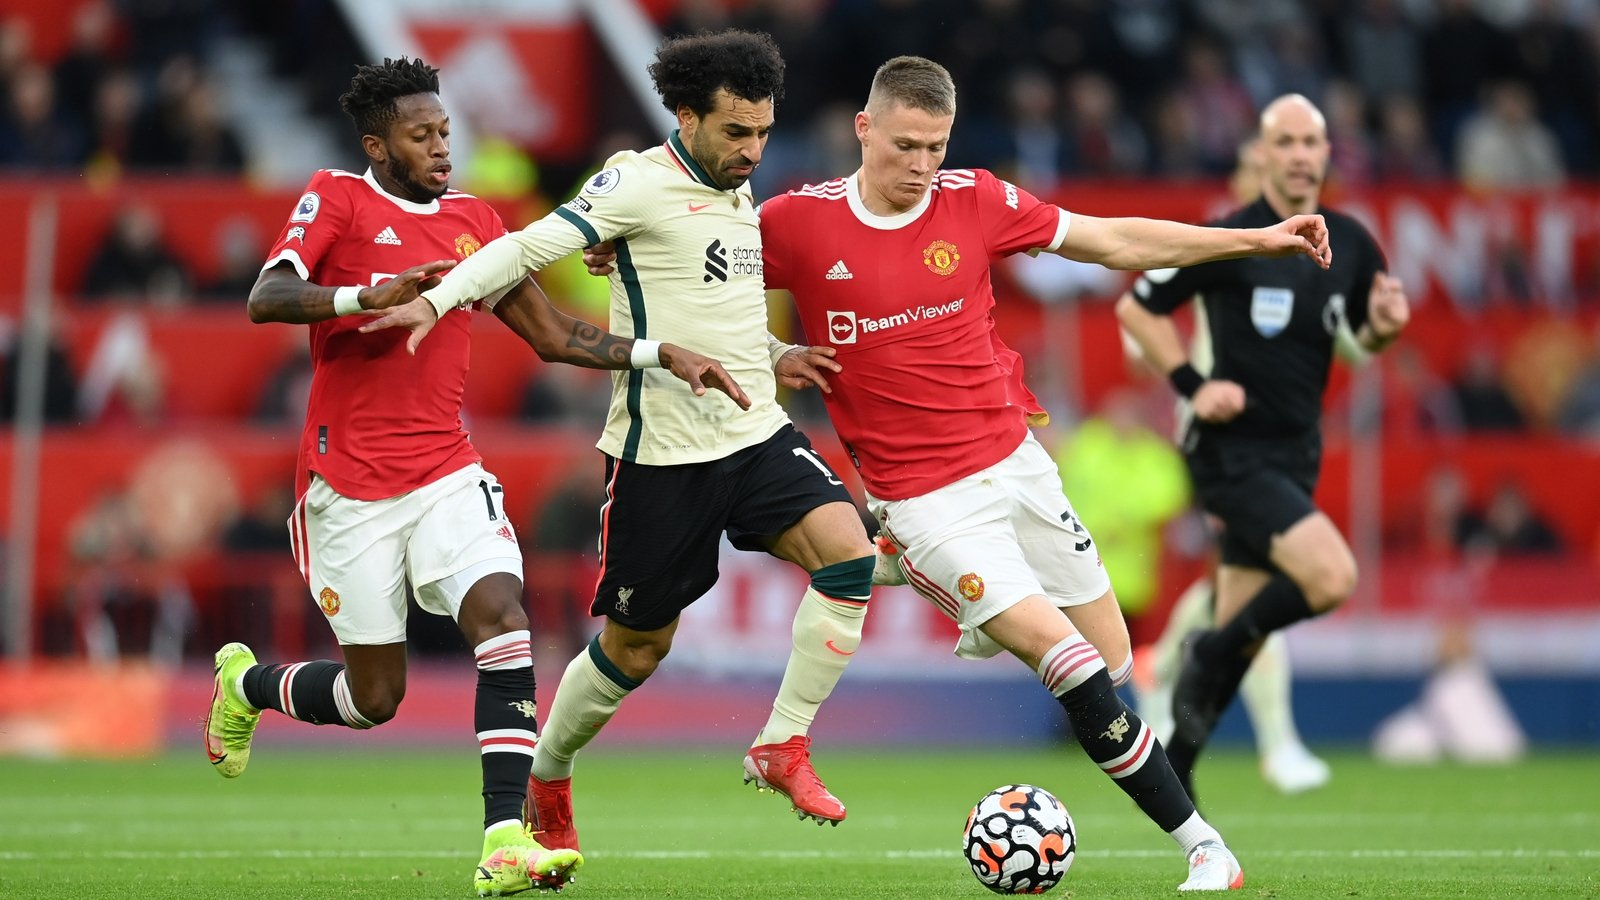 Recap: Manchester United 0-5 Liverpool - RTE.ie